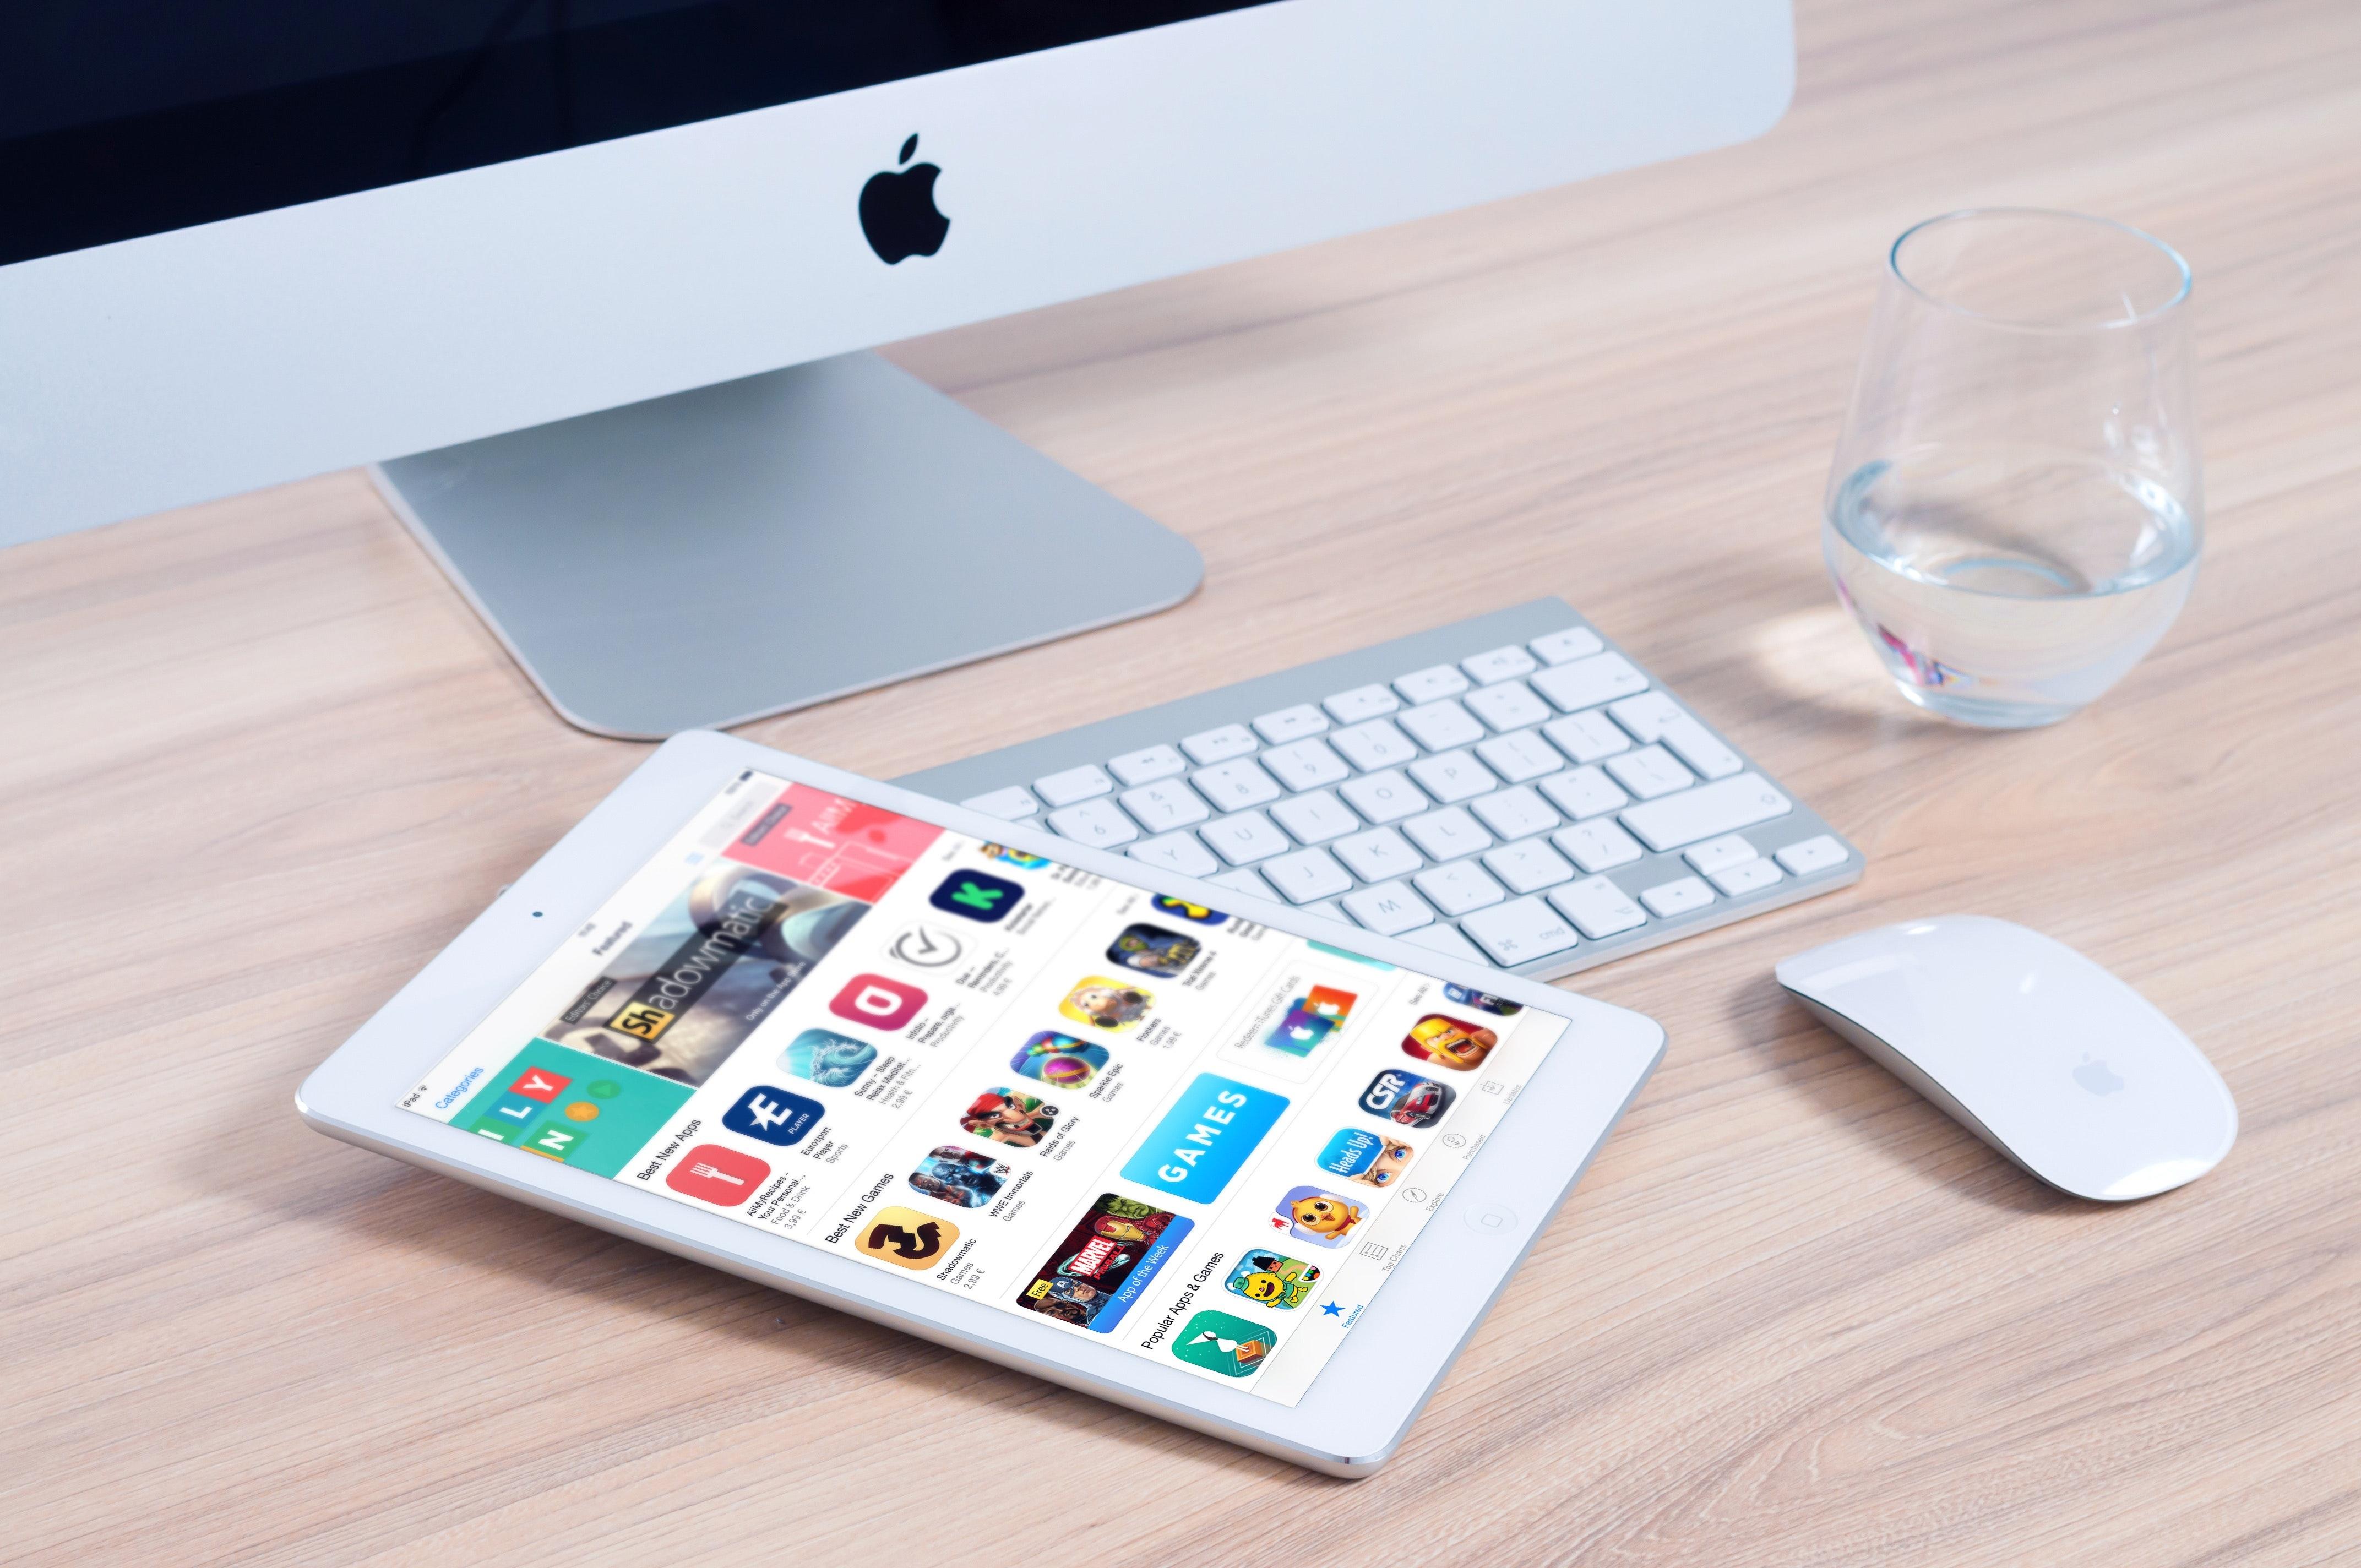 app apple application 38544